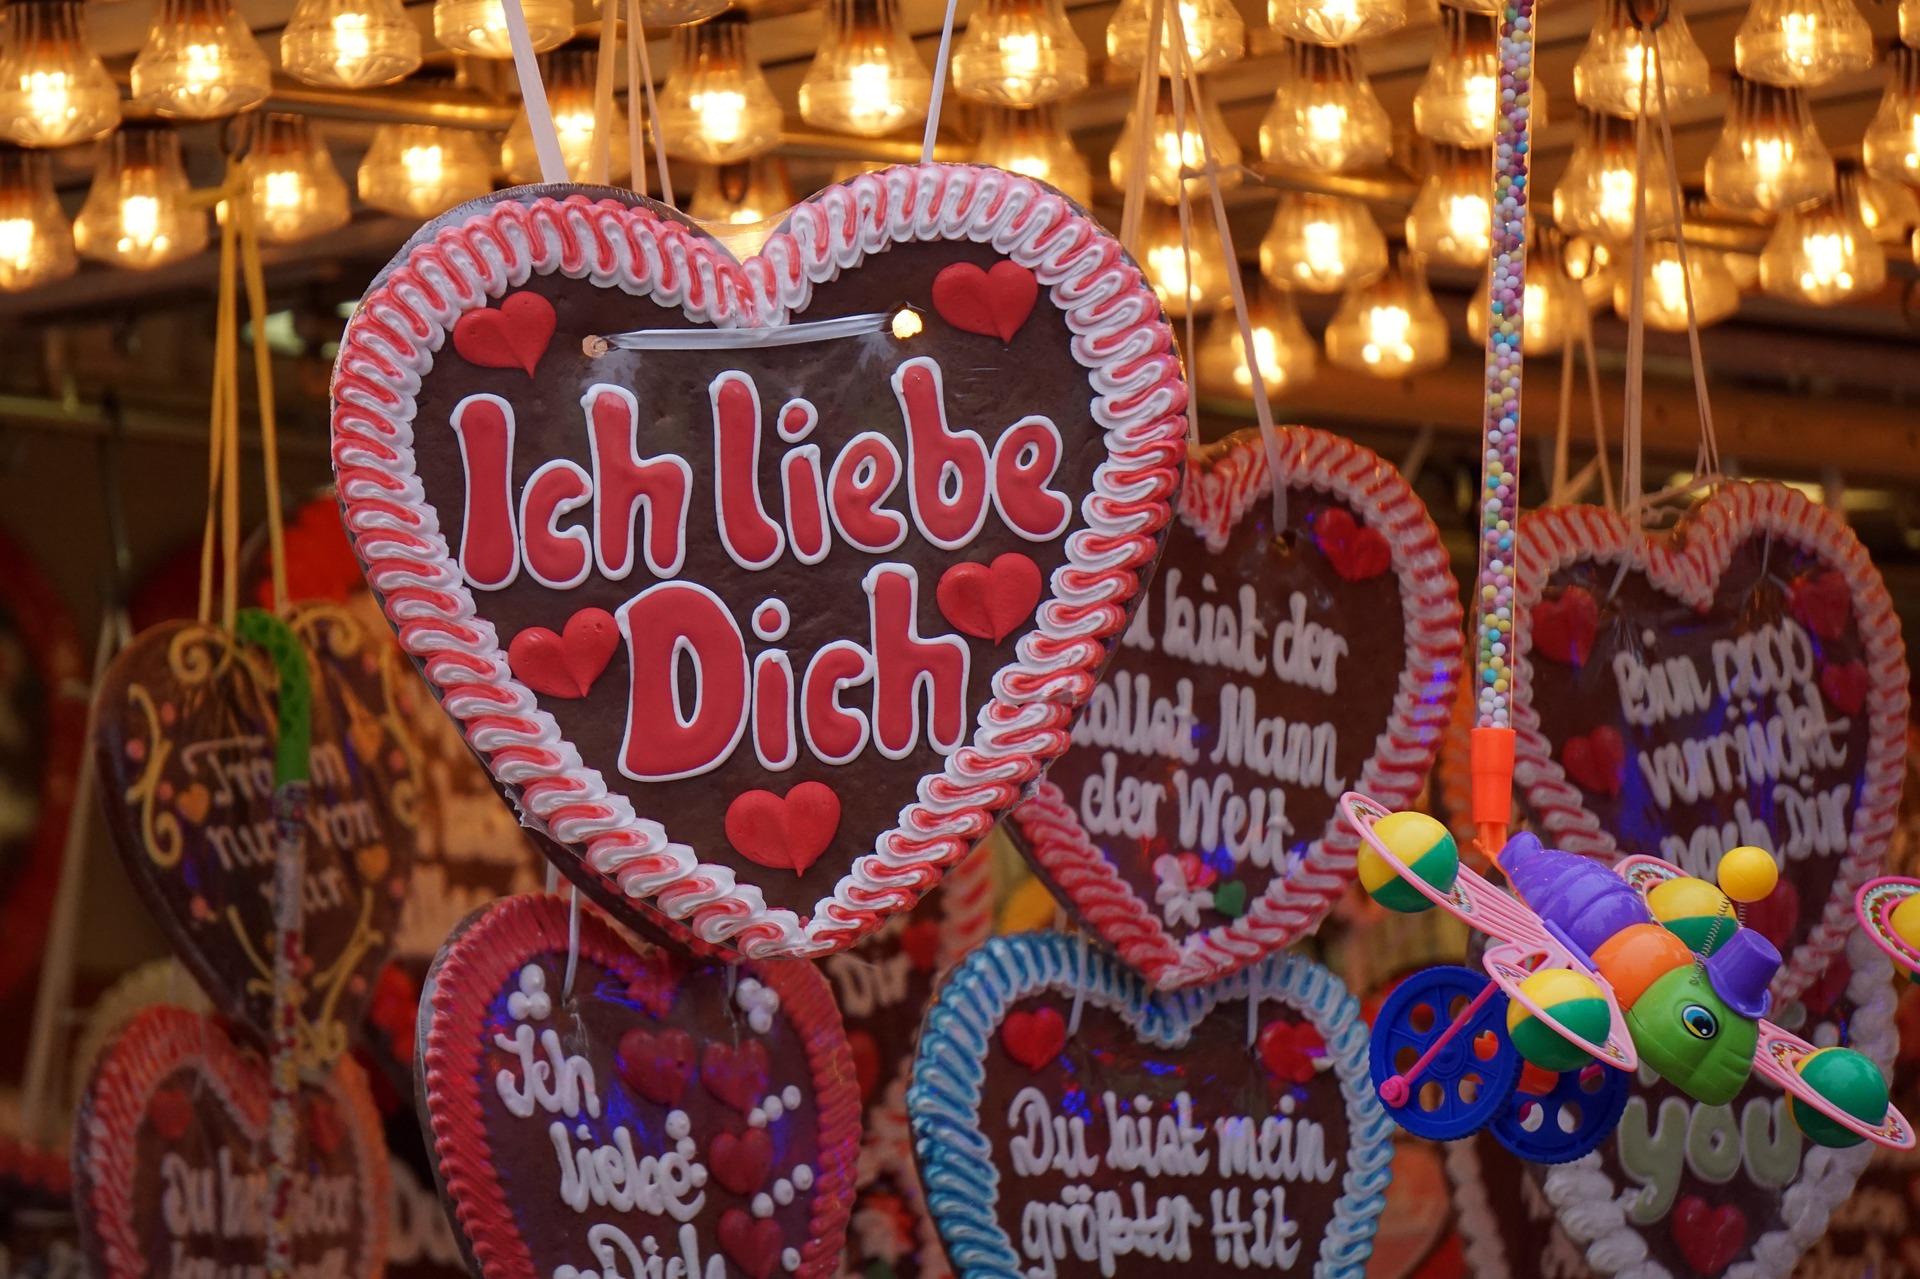 """Ich liebe dich"" written on a cookie from a state fair"